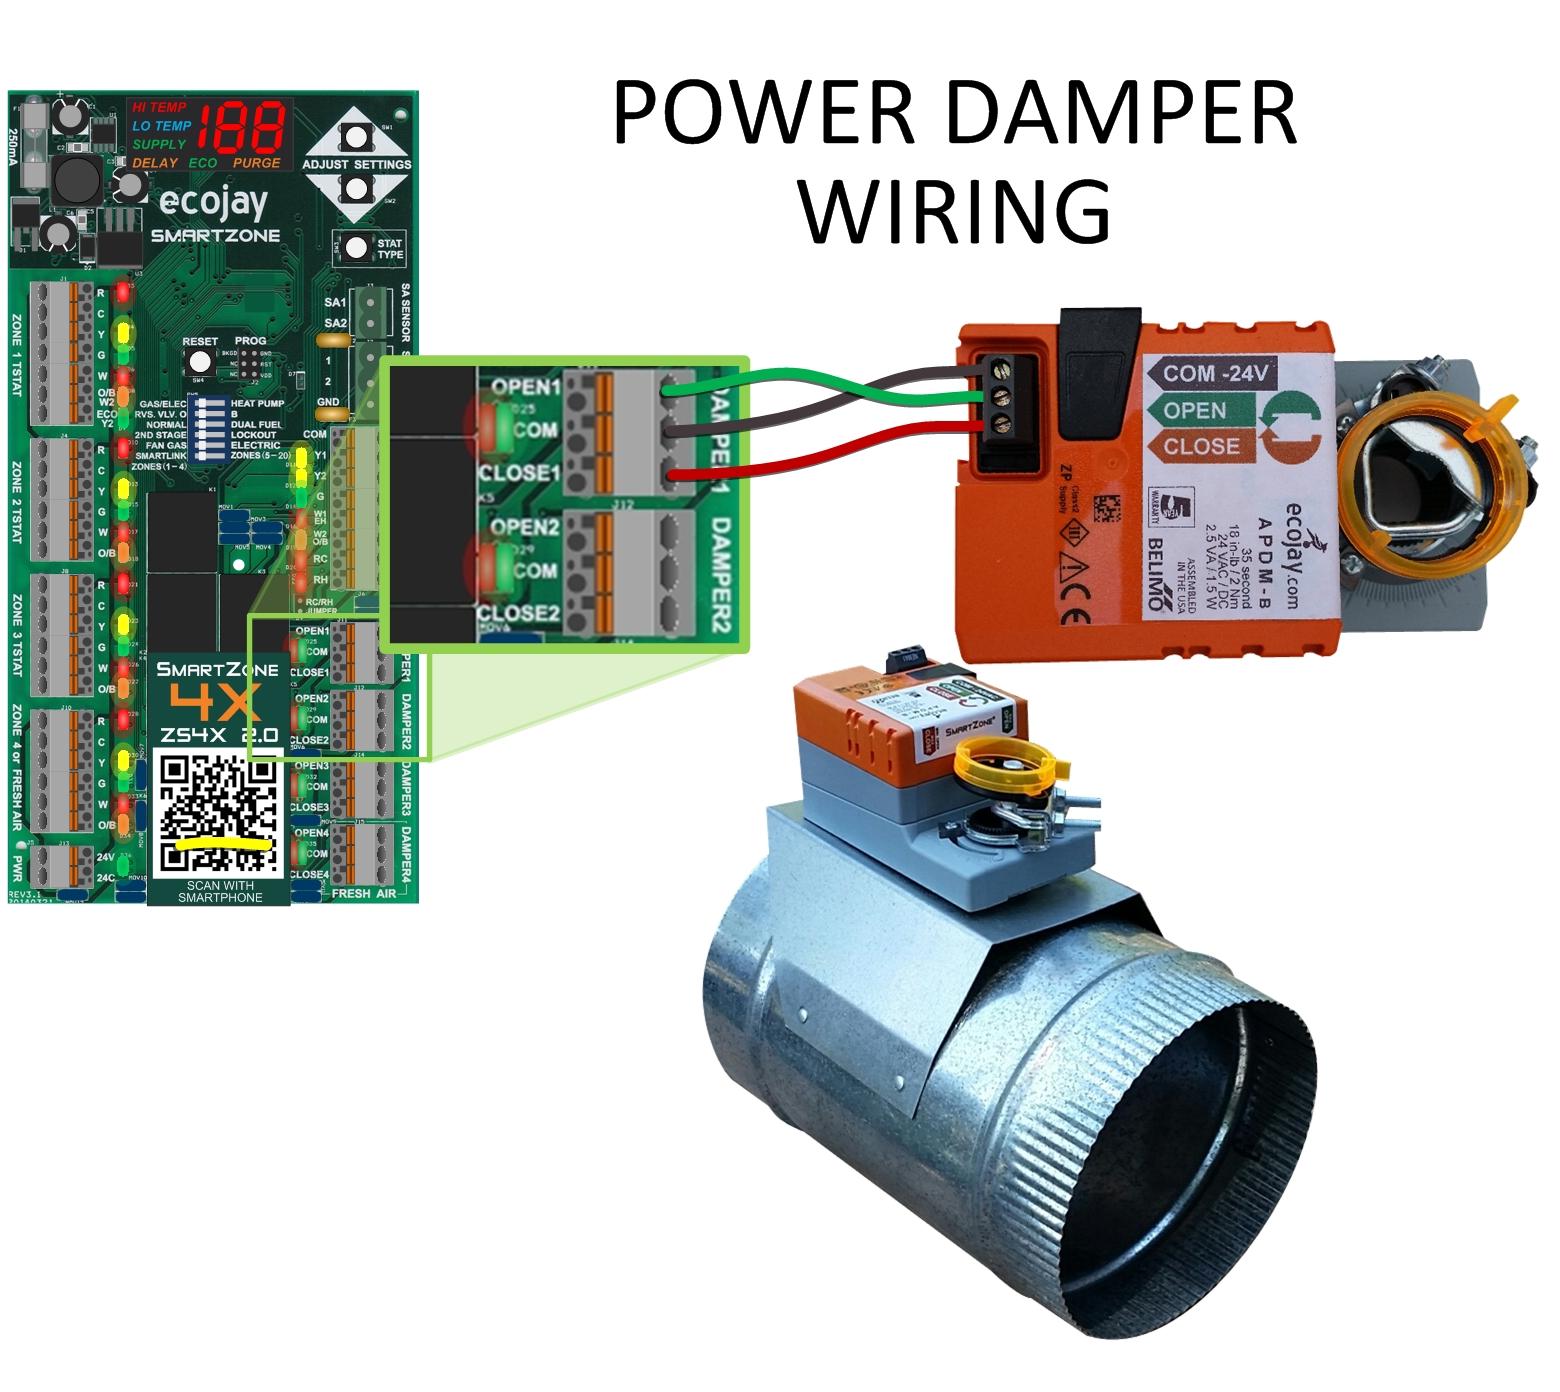 hight resolution of smartzone power open dampers wiring jpg